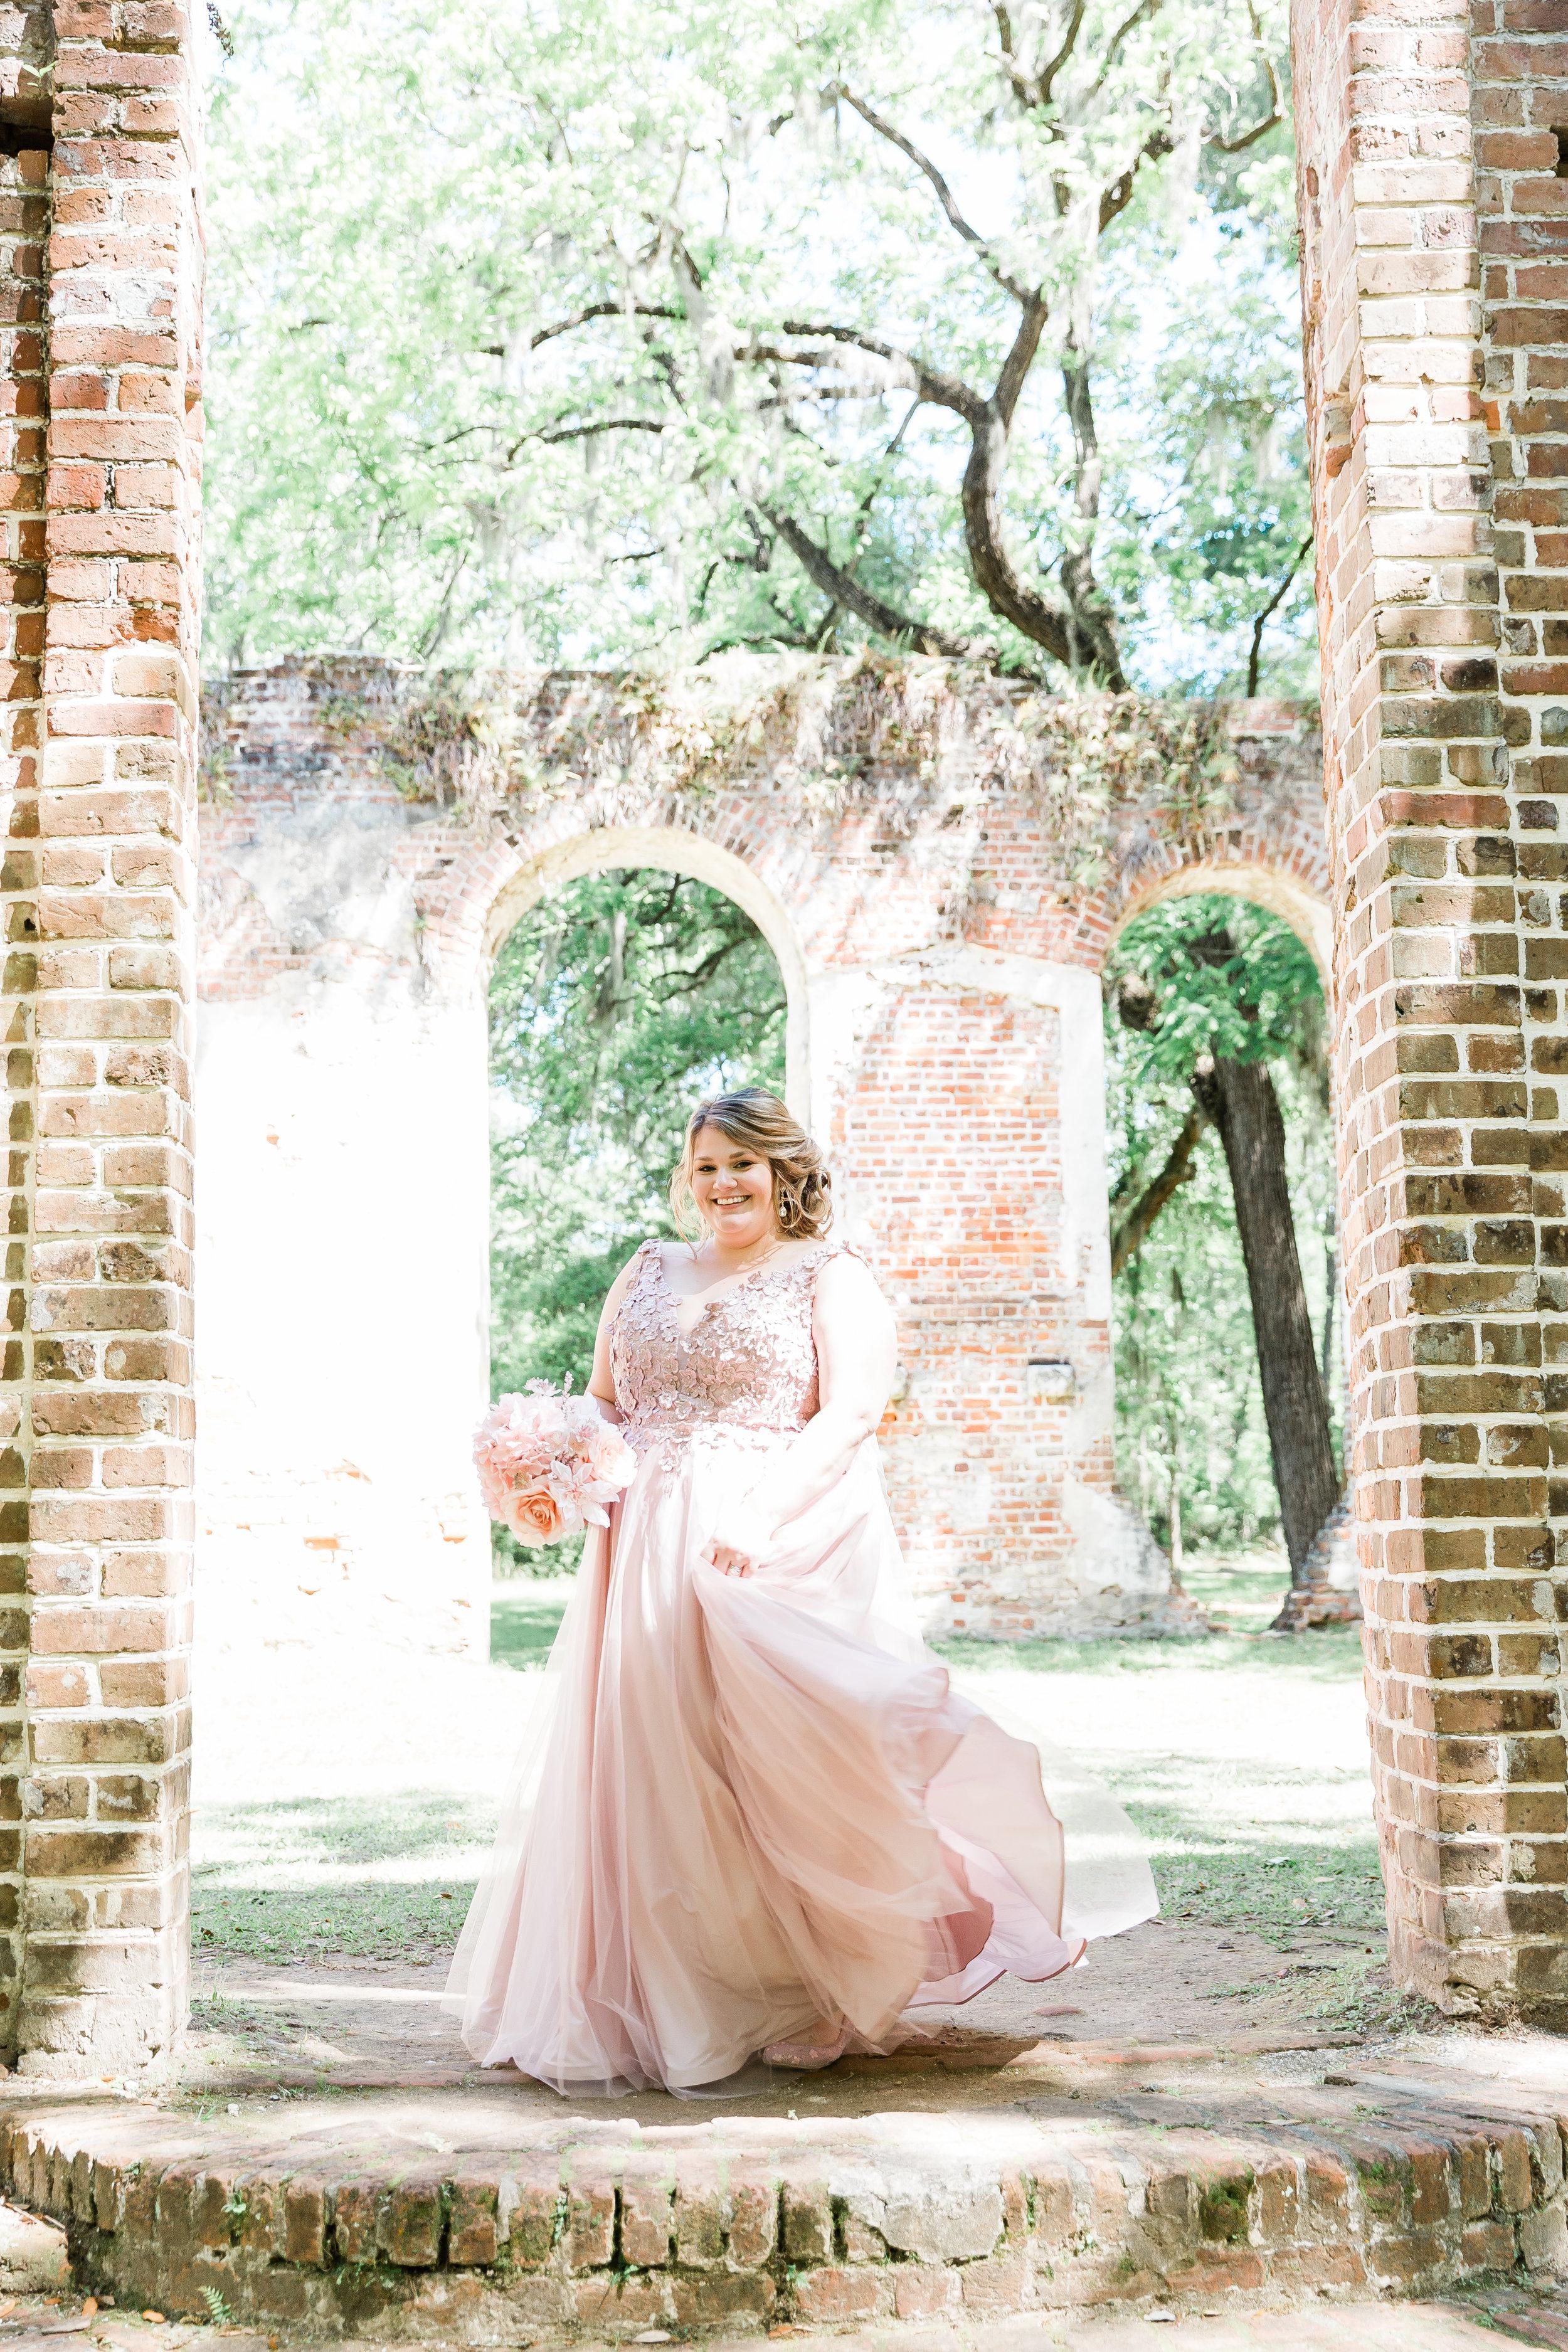 20190417-Southern Lens Photography-savannah family photographer- Ashley and Zack-old sheldon church ruins-201940.jpg